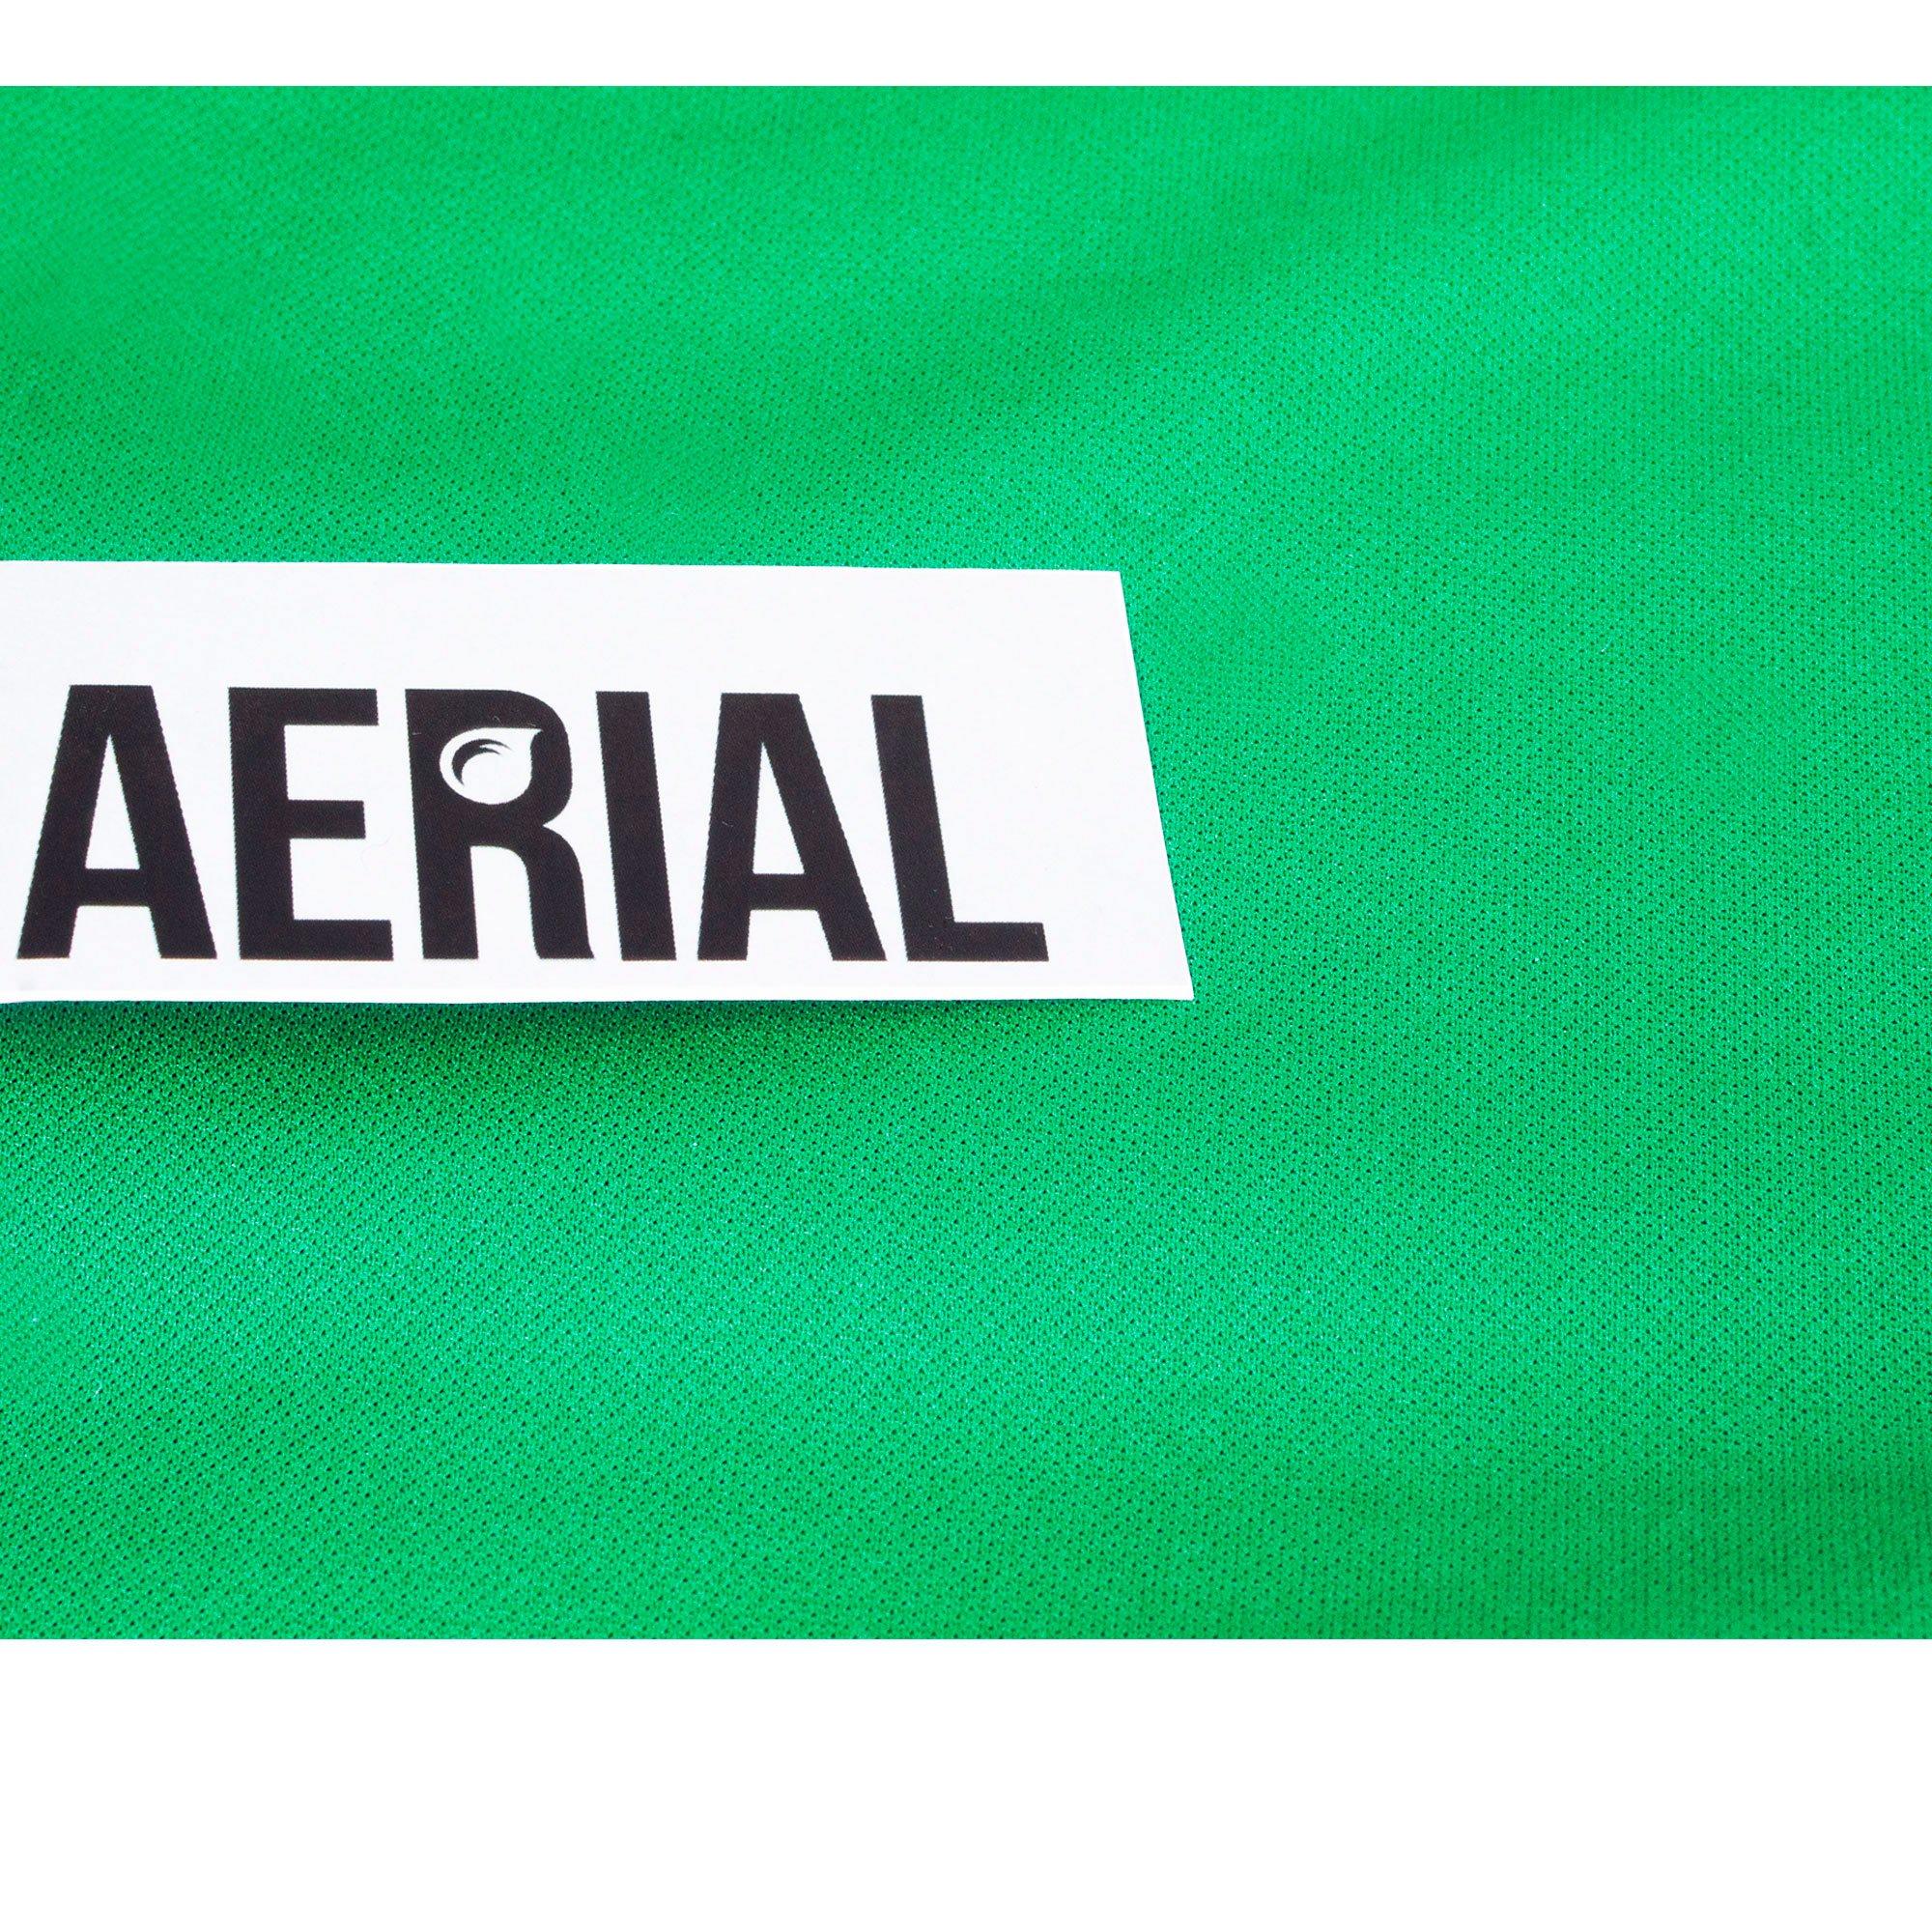 Firetoys Aerial Silk (Aerial Fabric Fabric Fabric / Tissus) - Kelly Grün-10 metres 911698